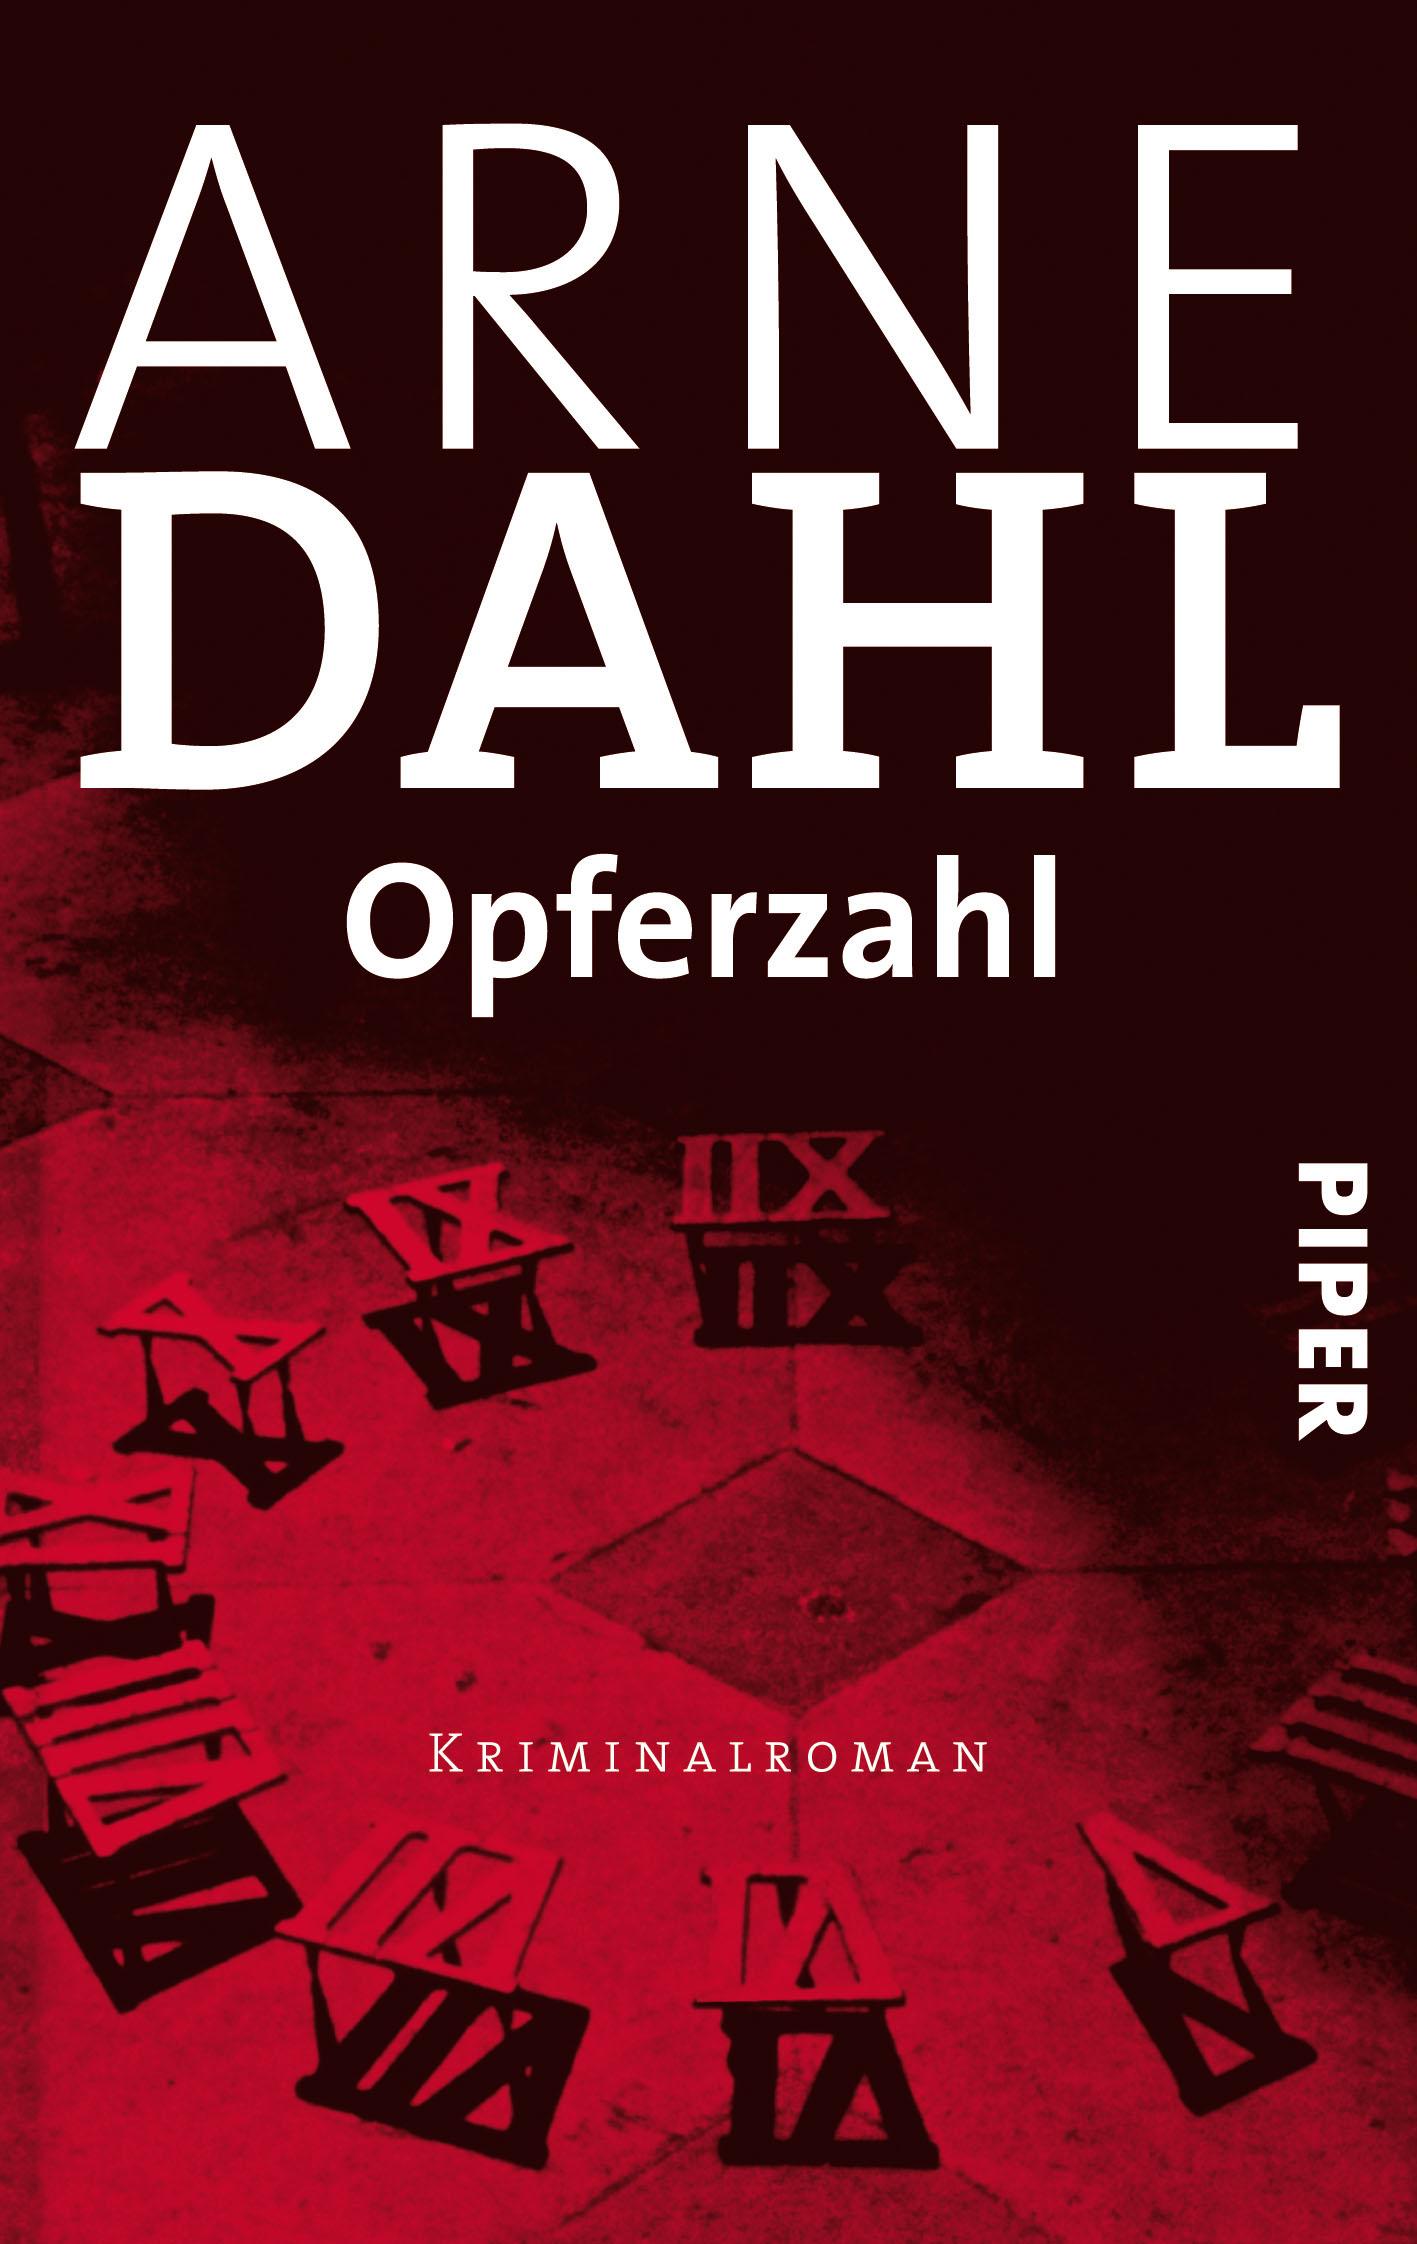 Opferzahl: Kriminalroman - Arne Dahl